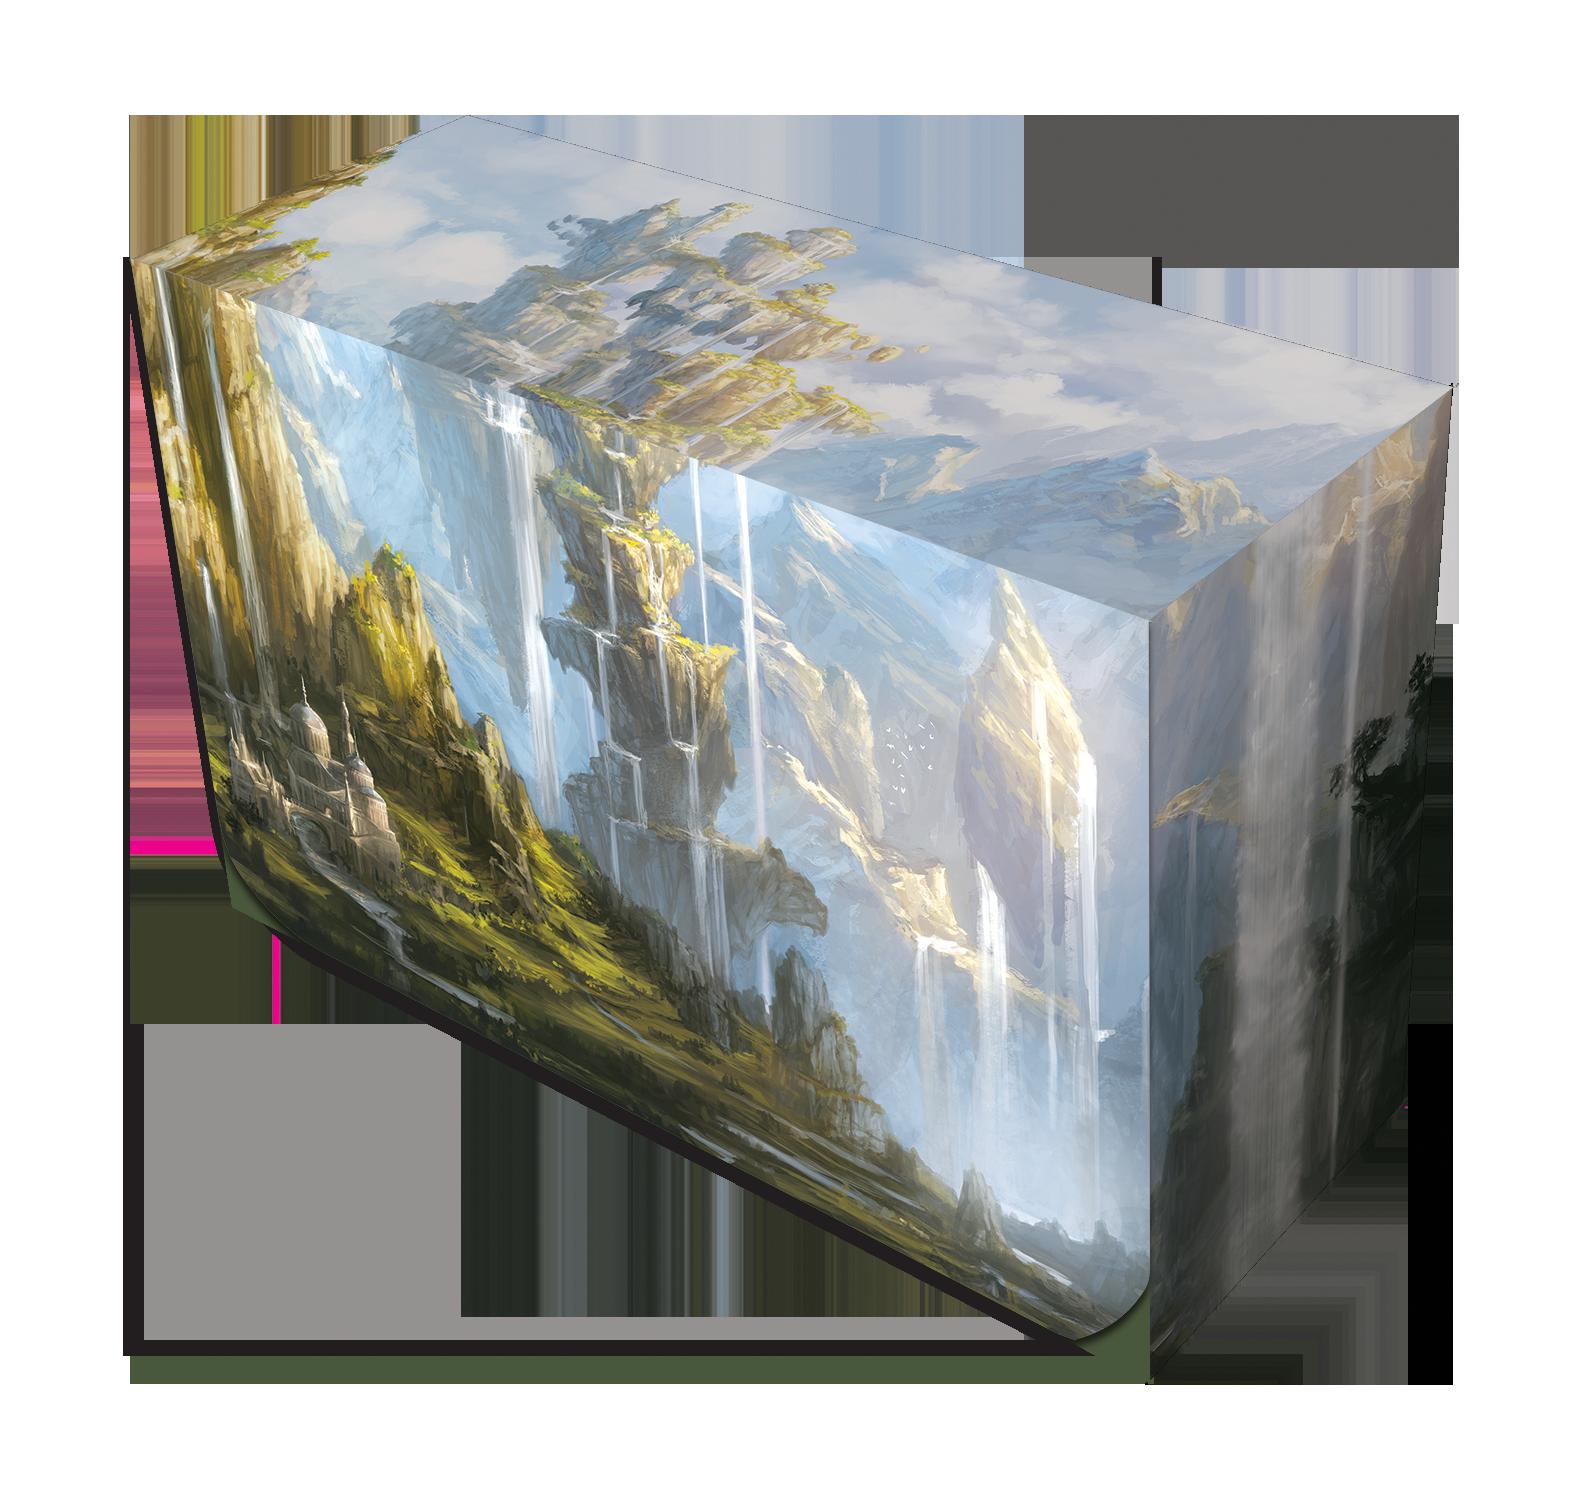 D-Box Veiled Kingdoms: Oasis